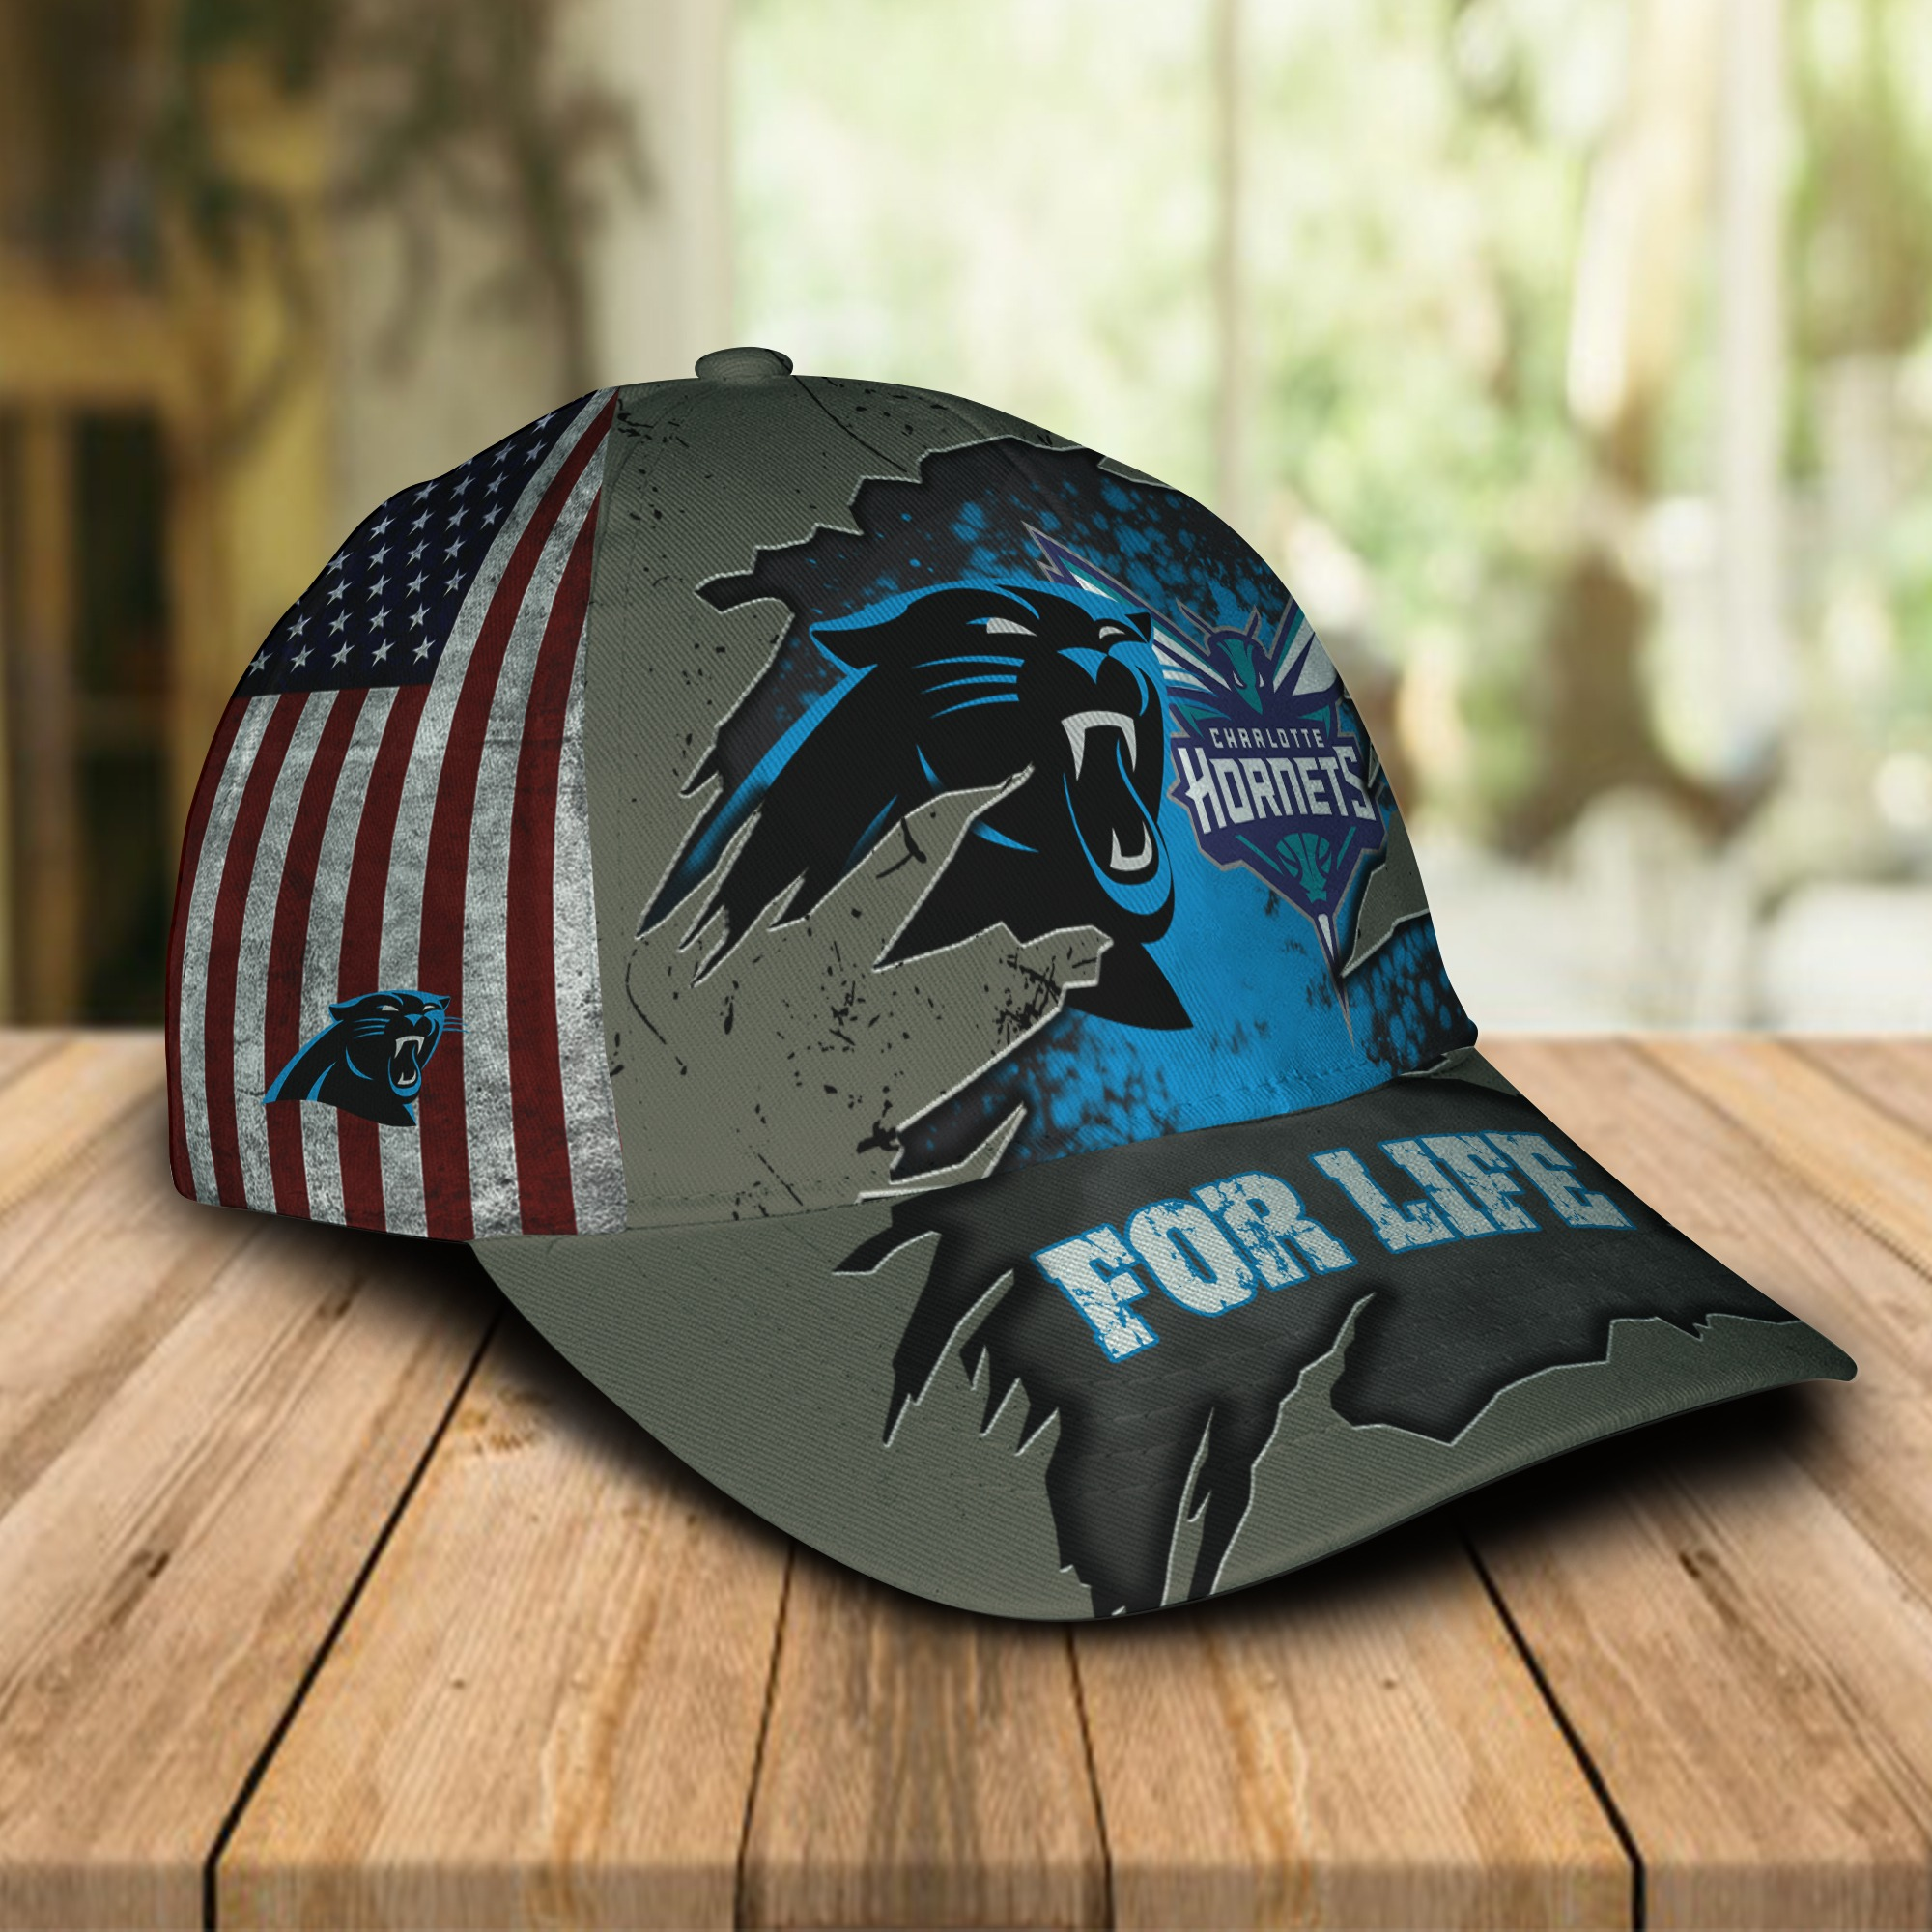 Carolina Panthers Charlotte Hornets for life cap 1